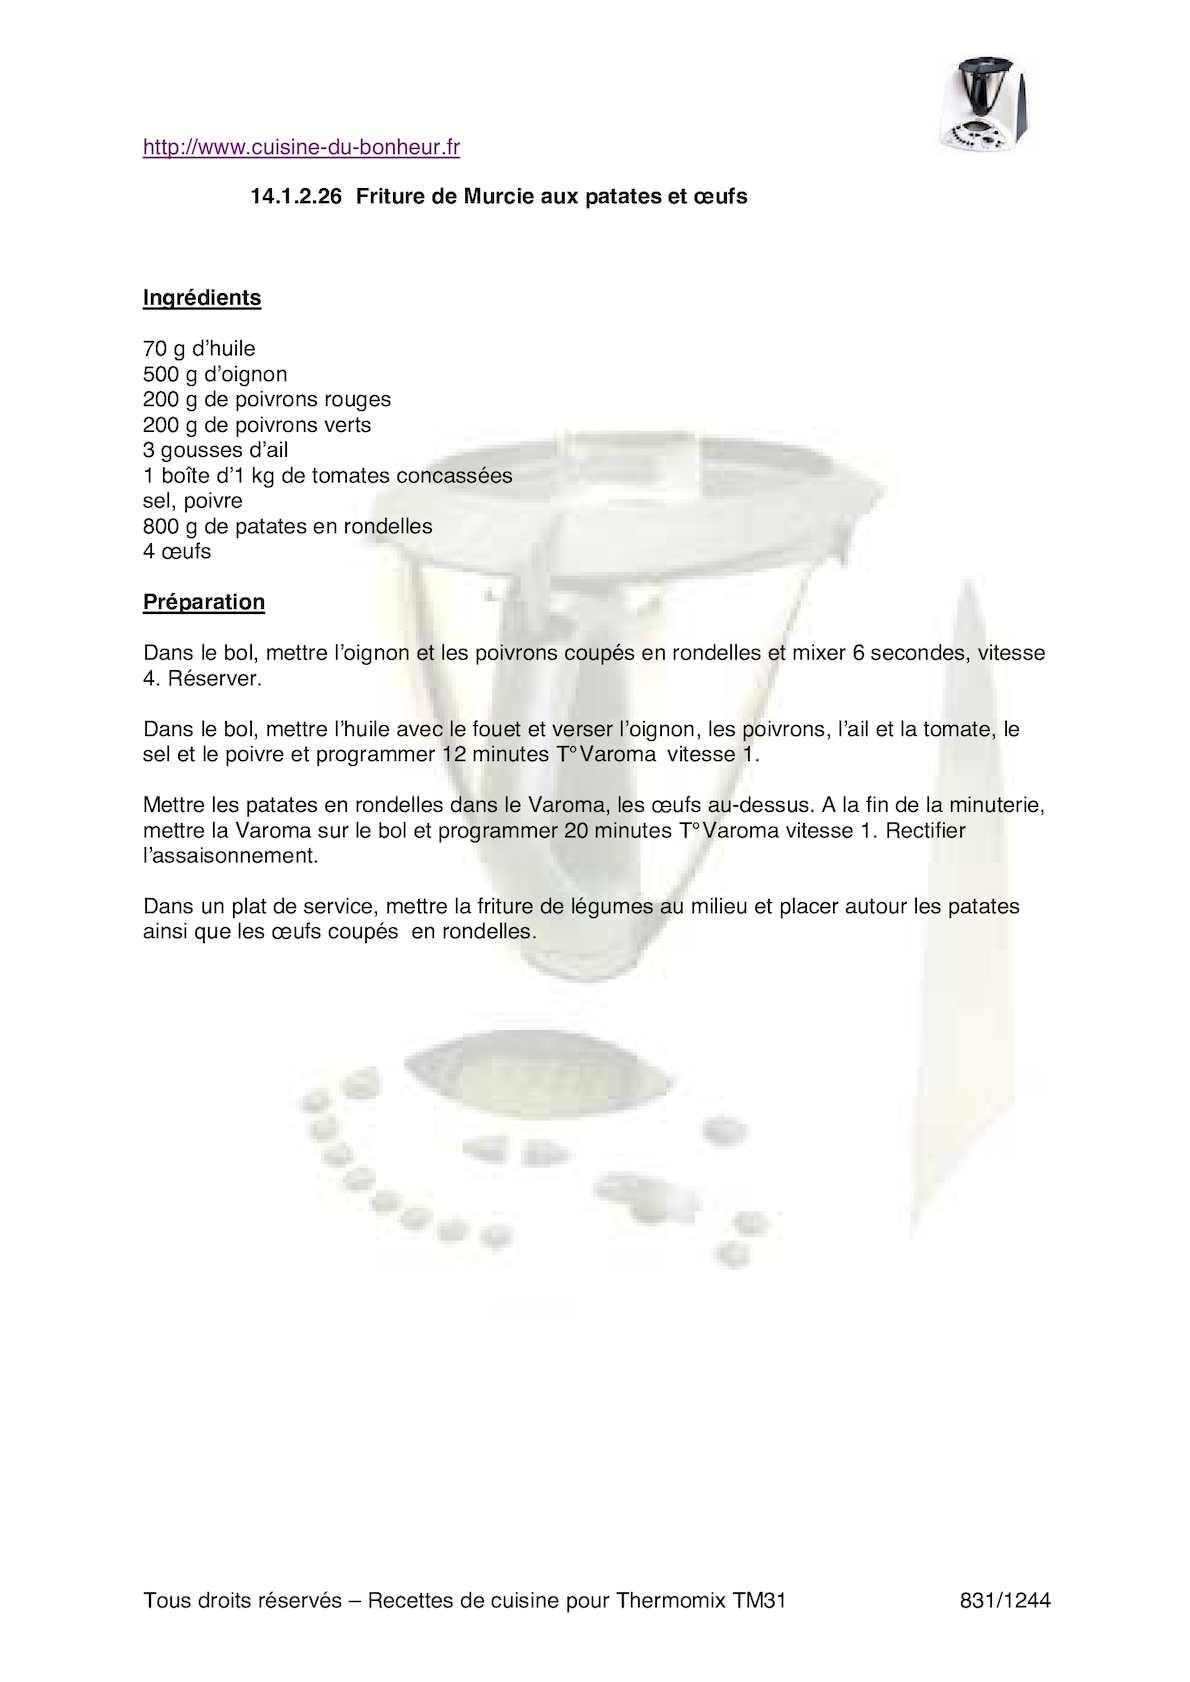 lapin thermomix varoma